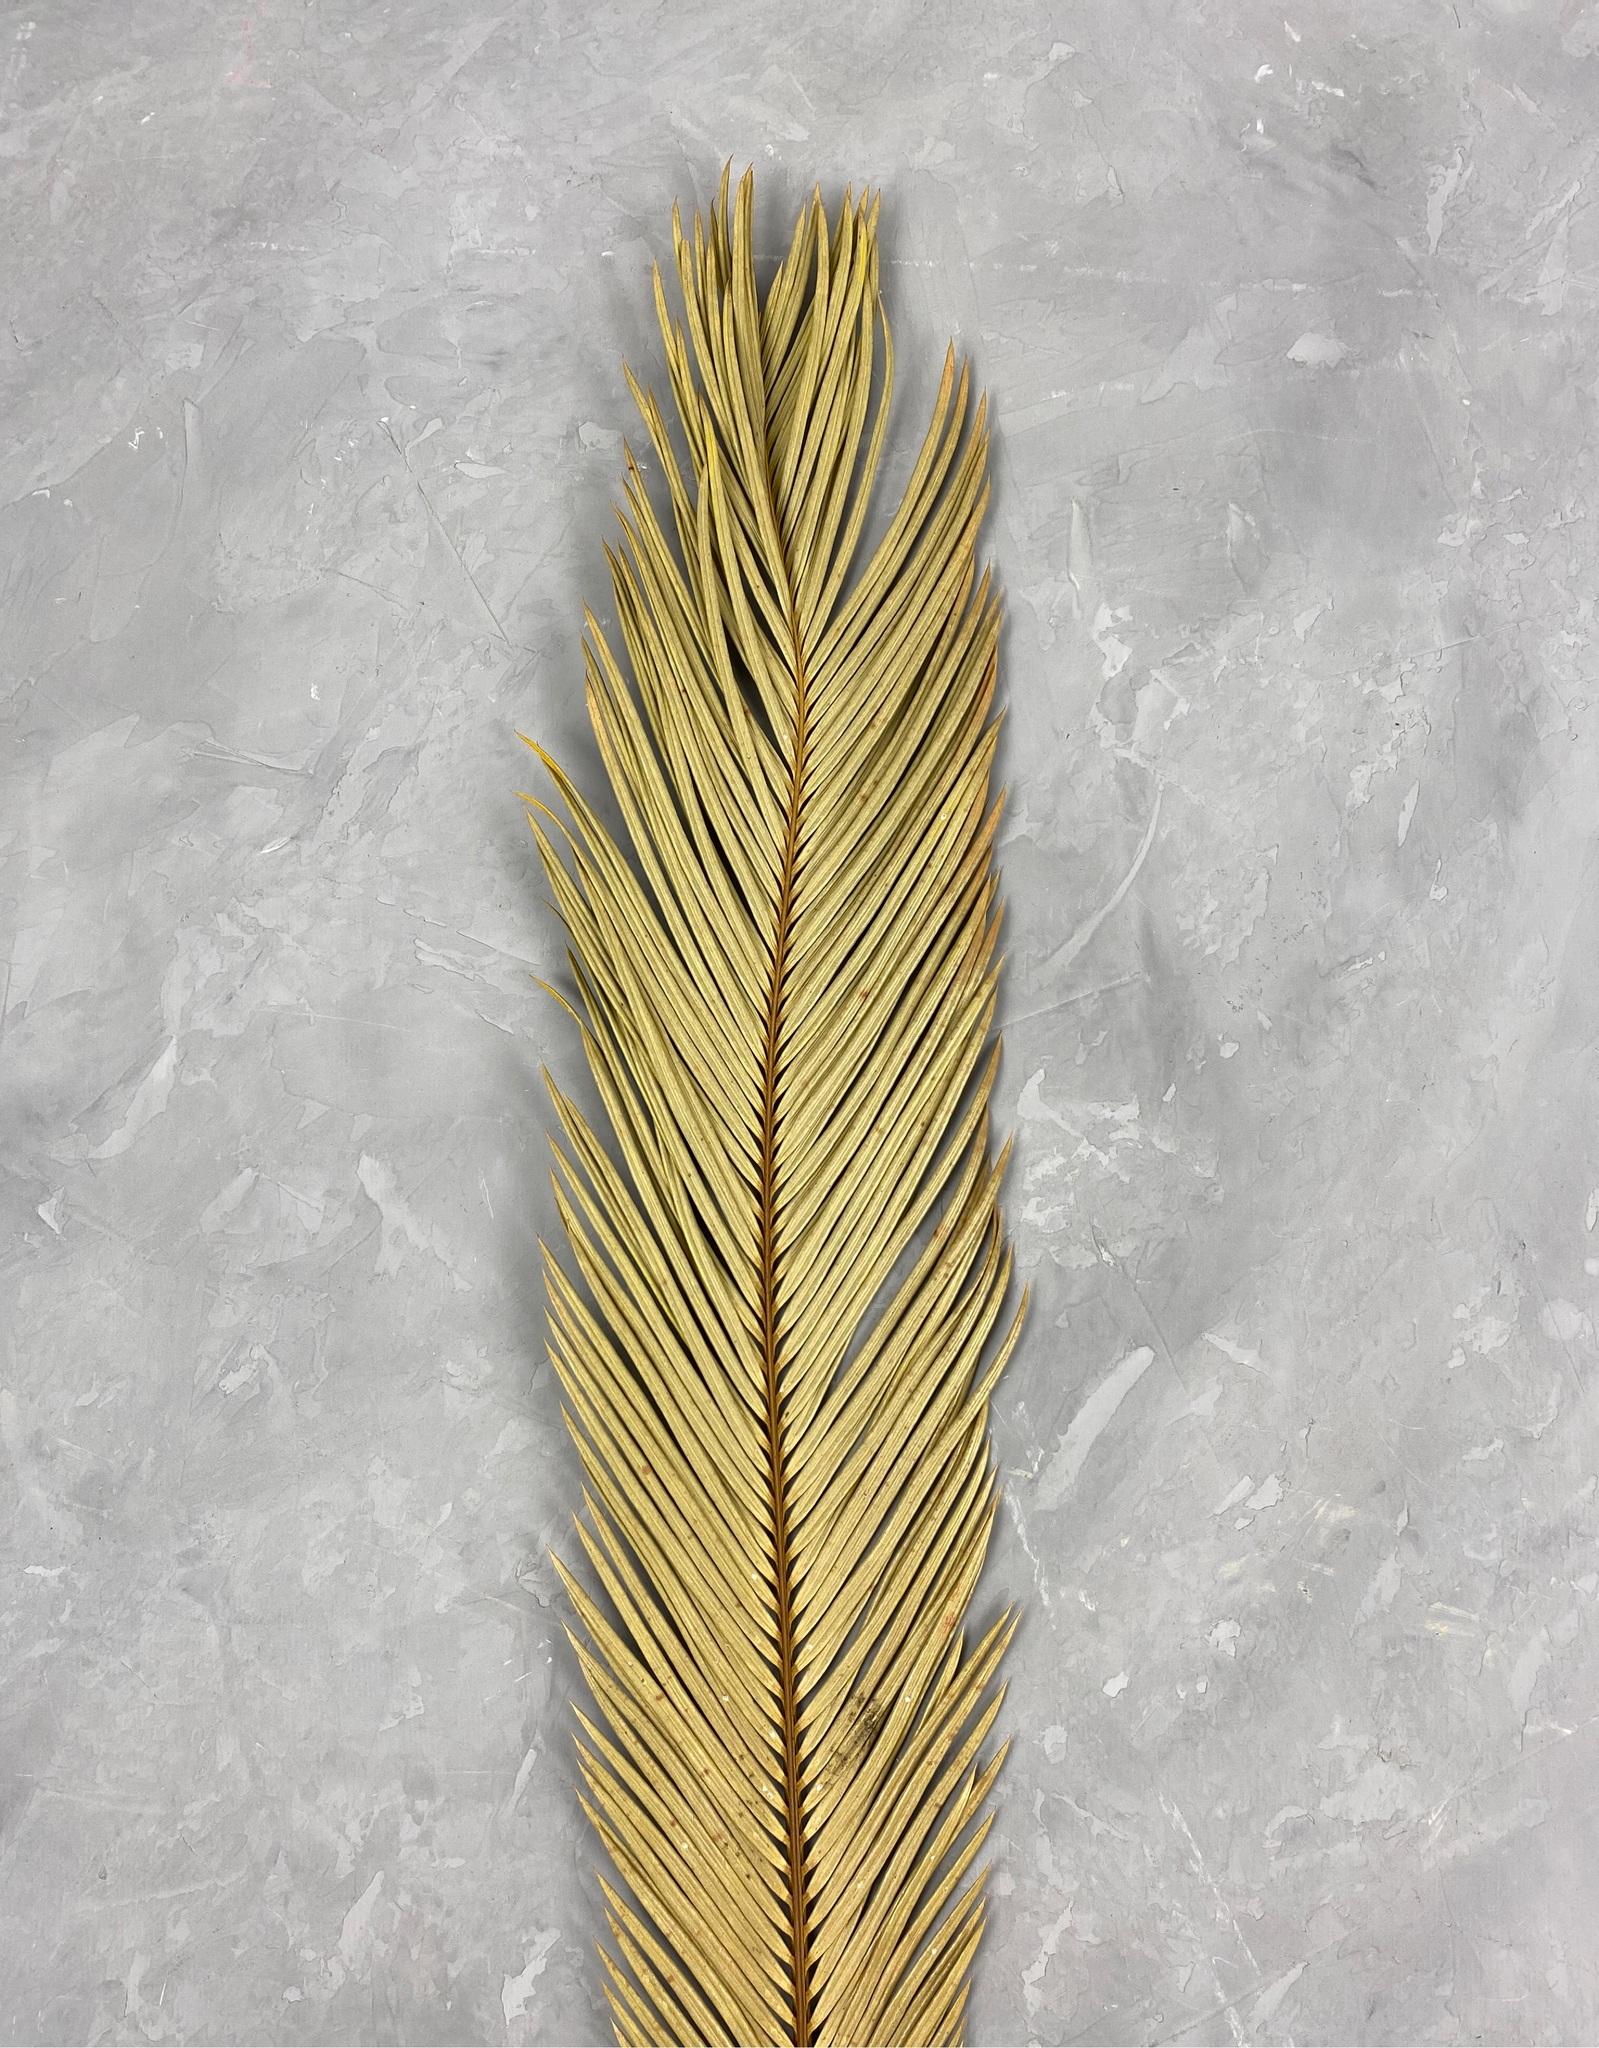 Лист пальмы Цикас натуральный